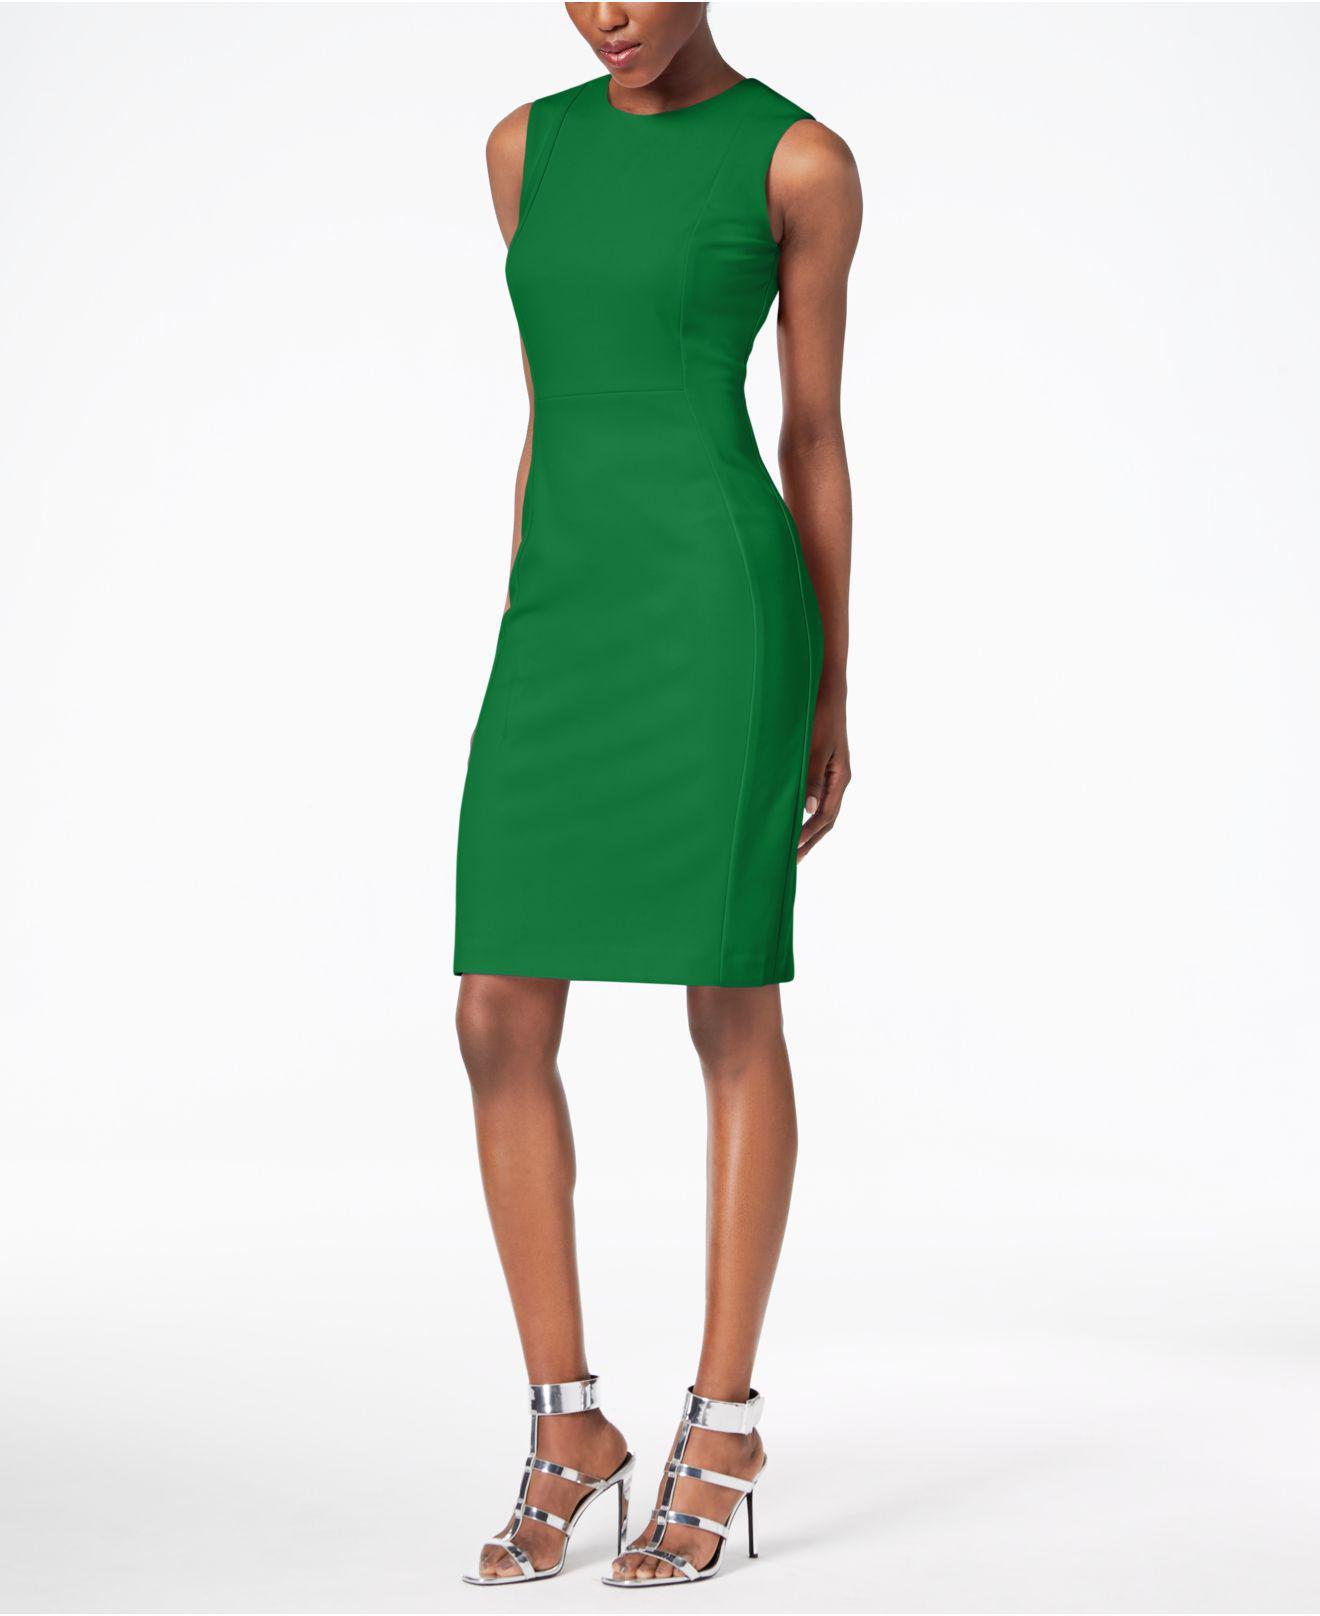 Lyst - Calvin Klein 205W39Nyc Scuba Crepe Sheath Dress, Regular ...